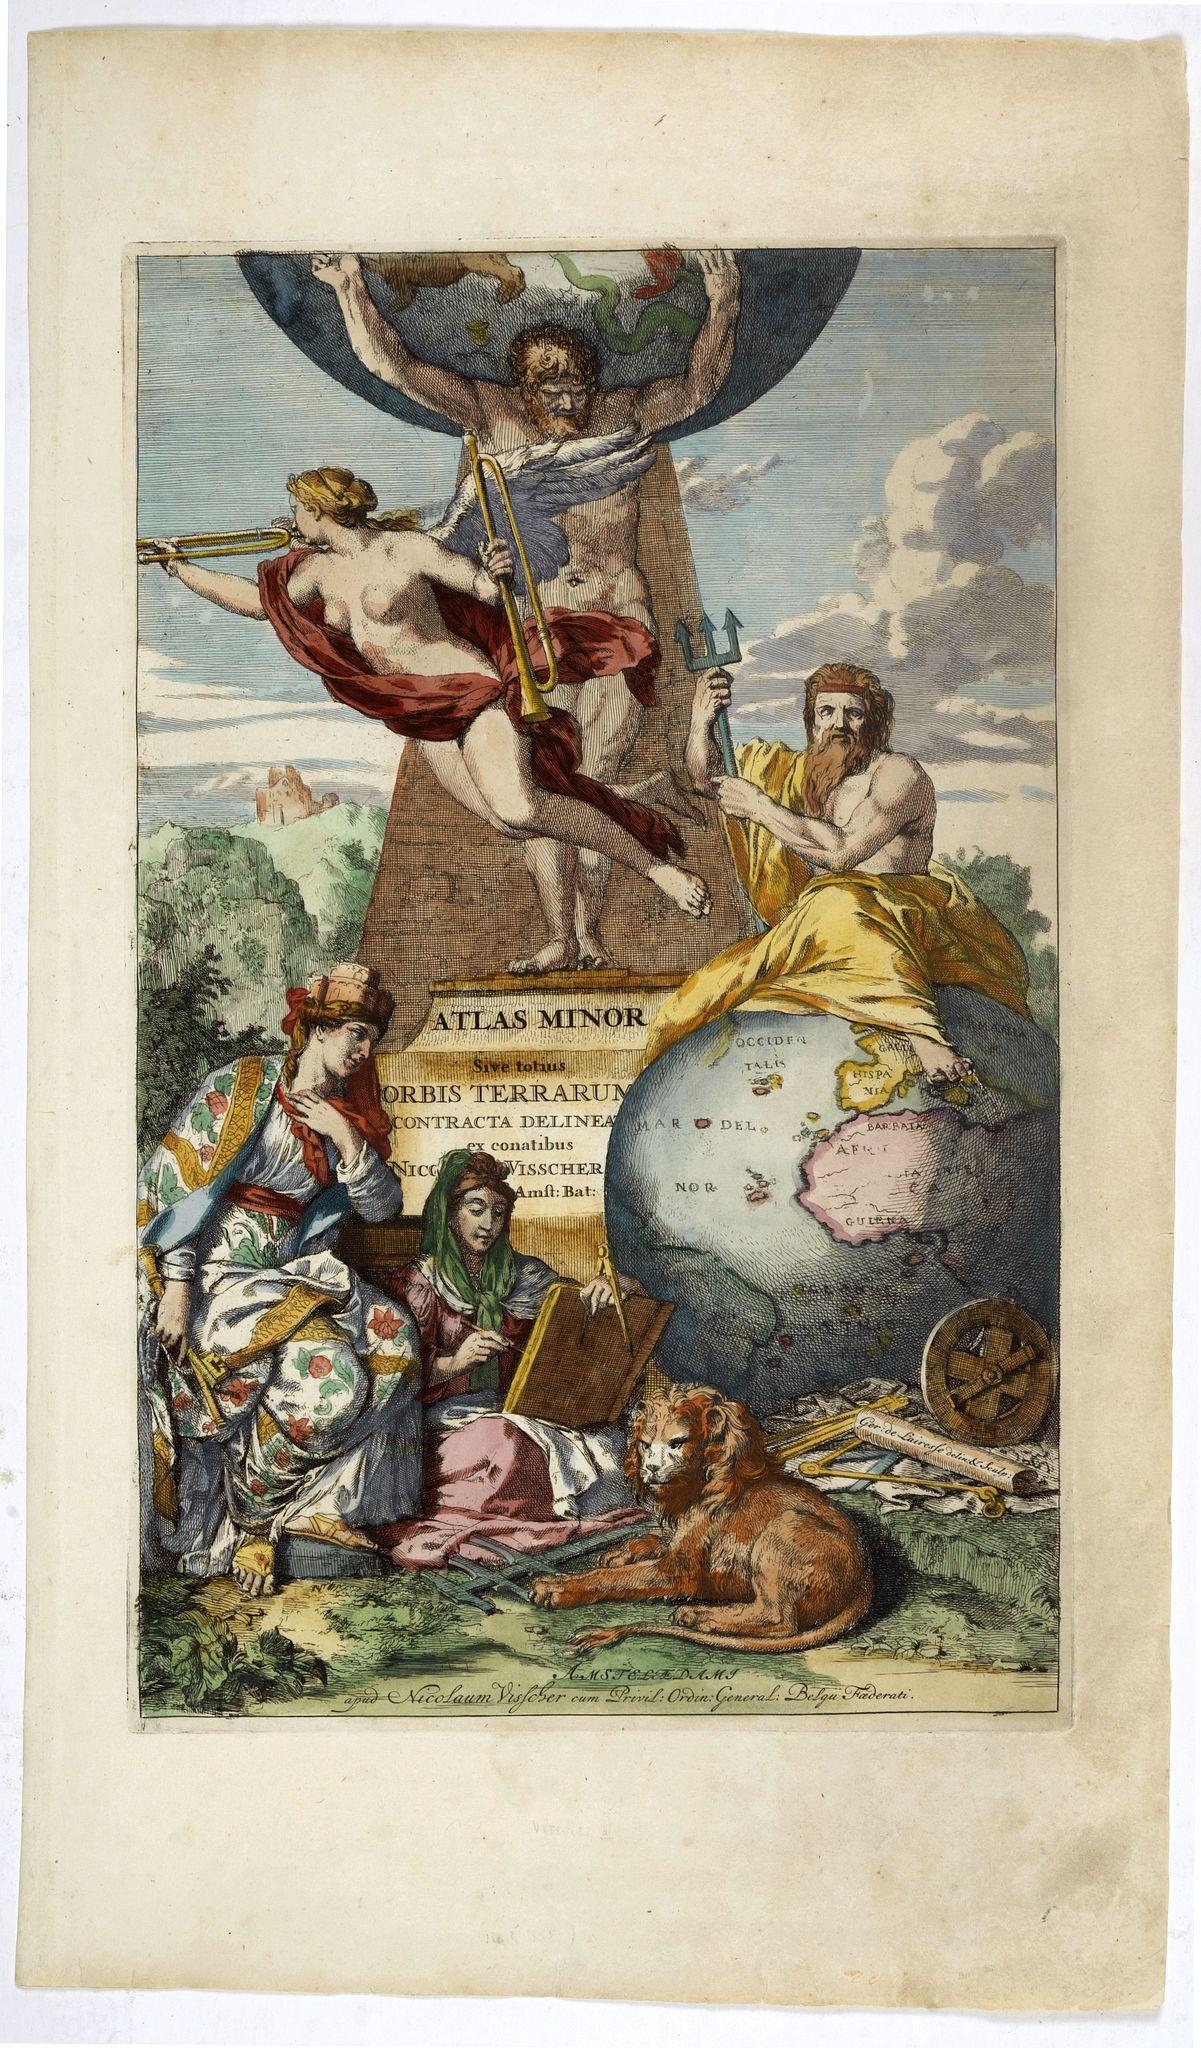 VISSCHER, N. -  [Title page]  Atlas Minor sive totius Orbis Terrarum..